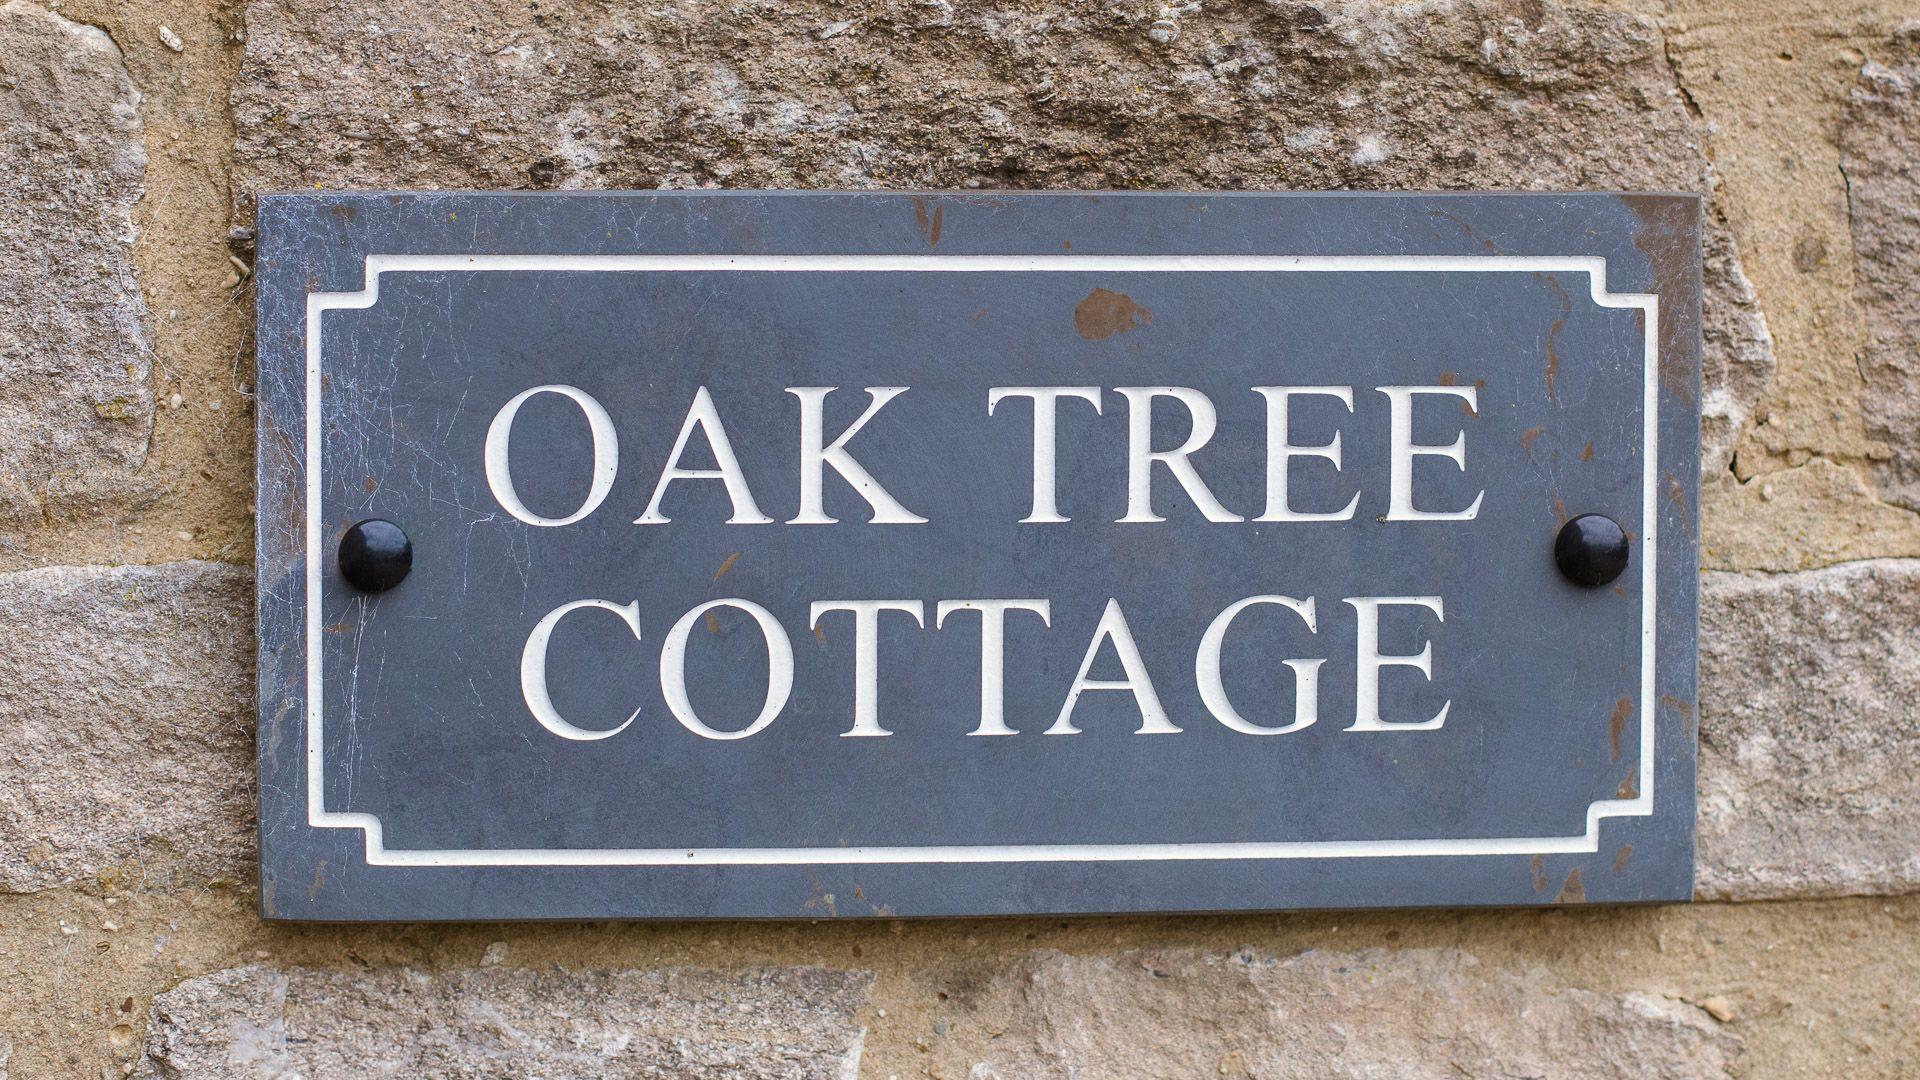 Cottage Sign, Oak Tree Cottage, Bolthole Retreats